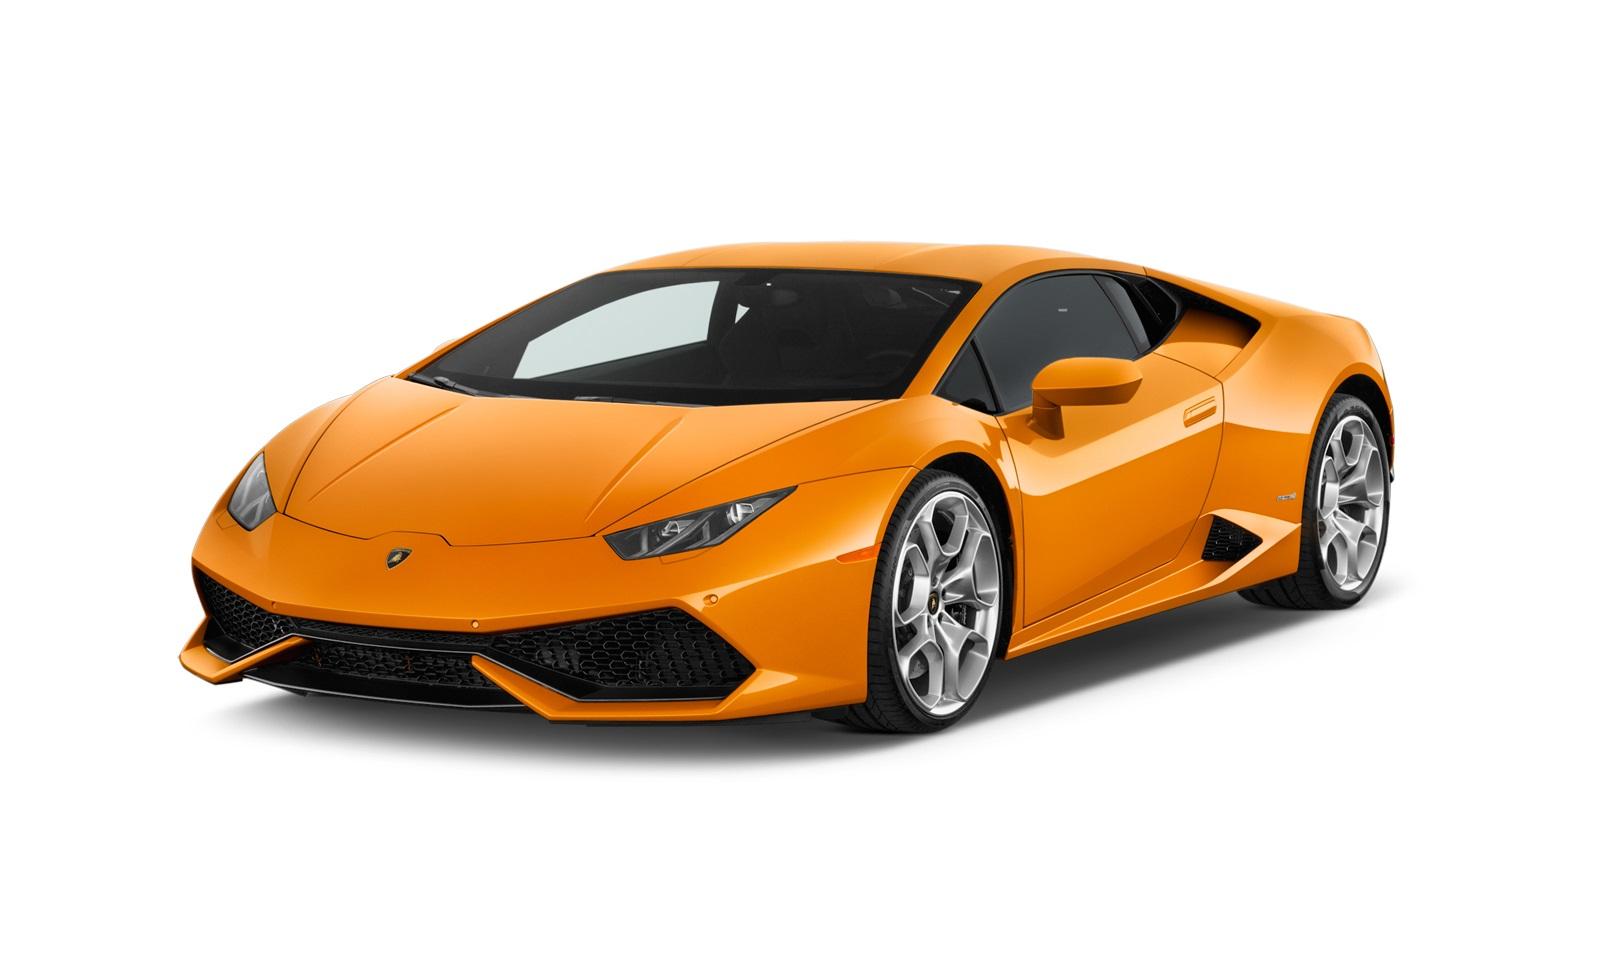 Lamborghini Huracan Price In Uae New Lamborghini Huracan Photos